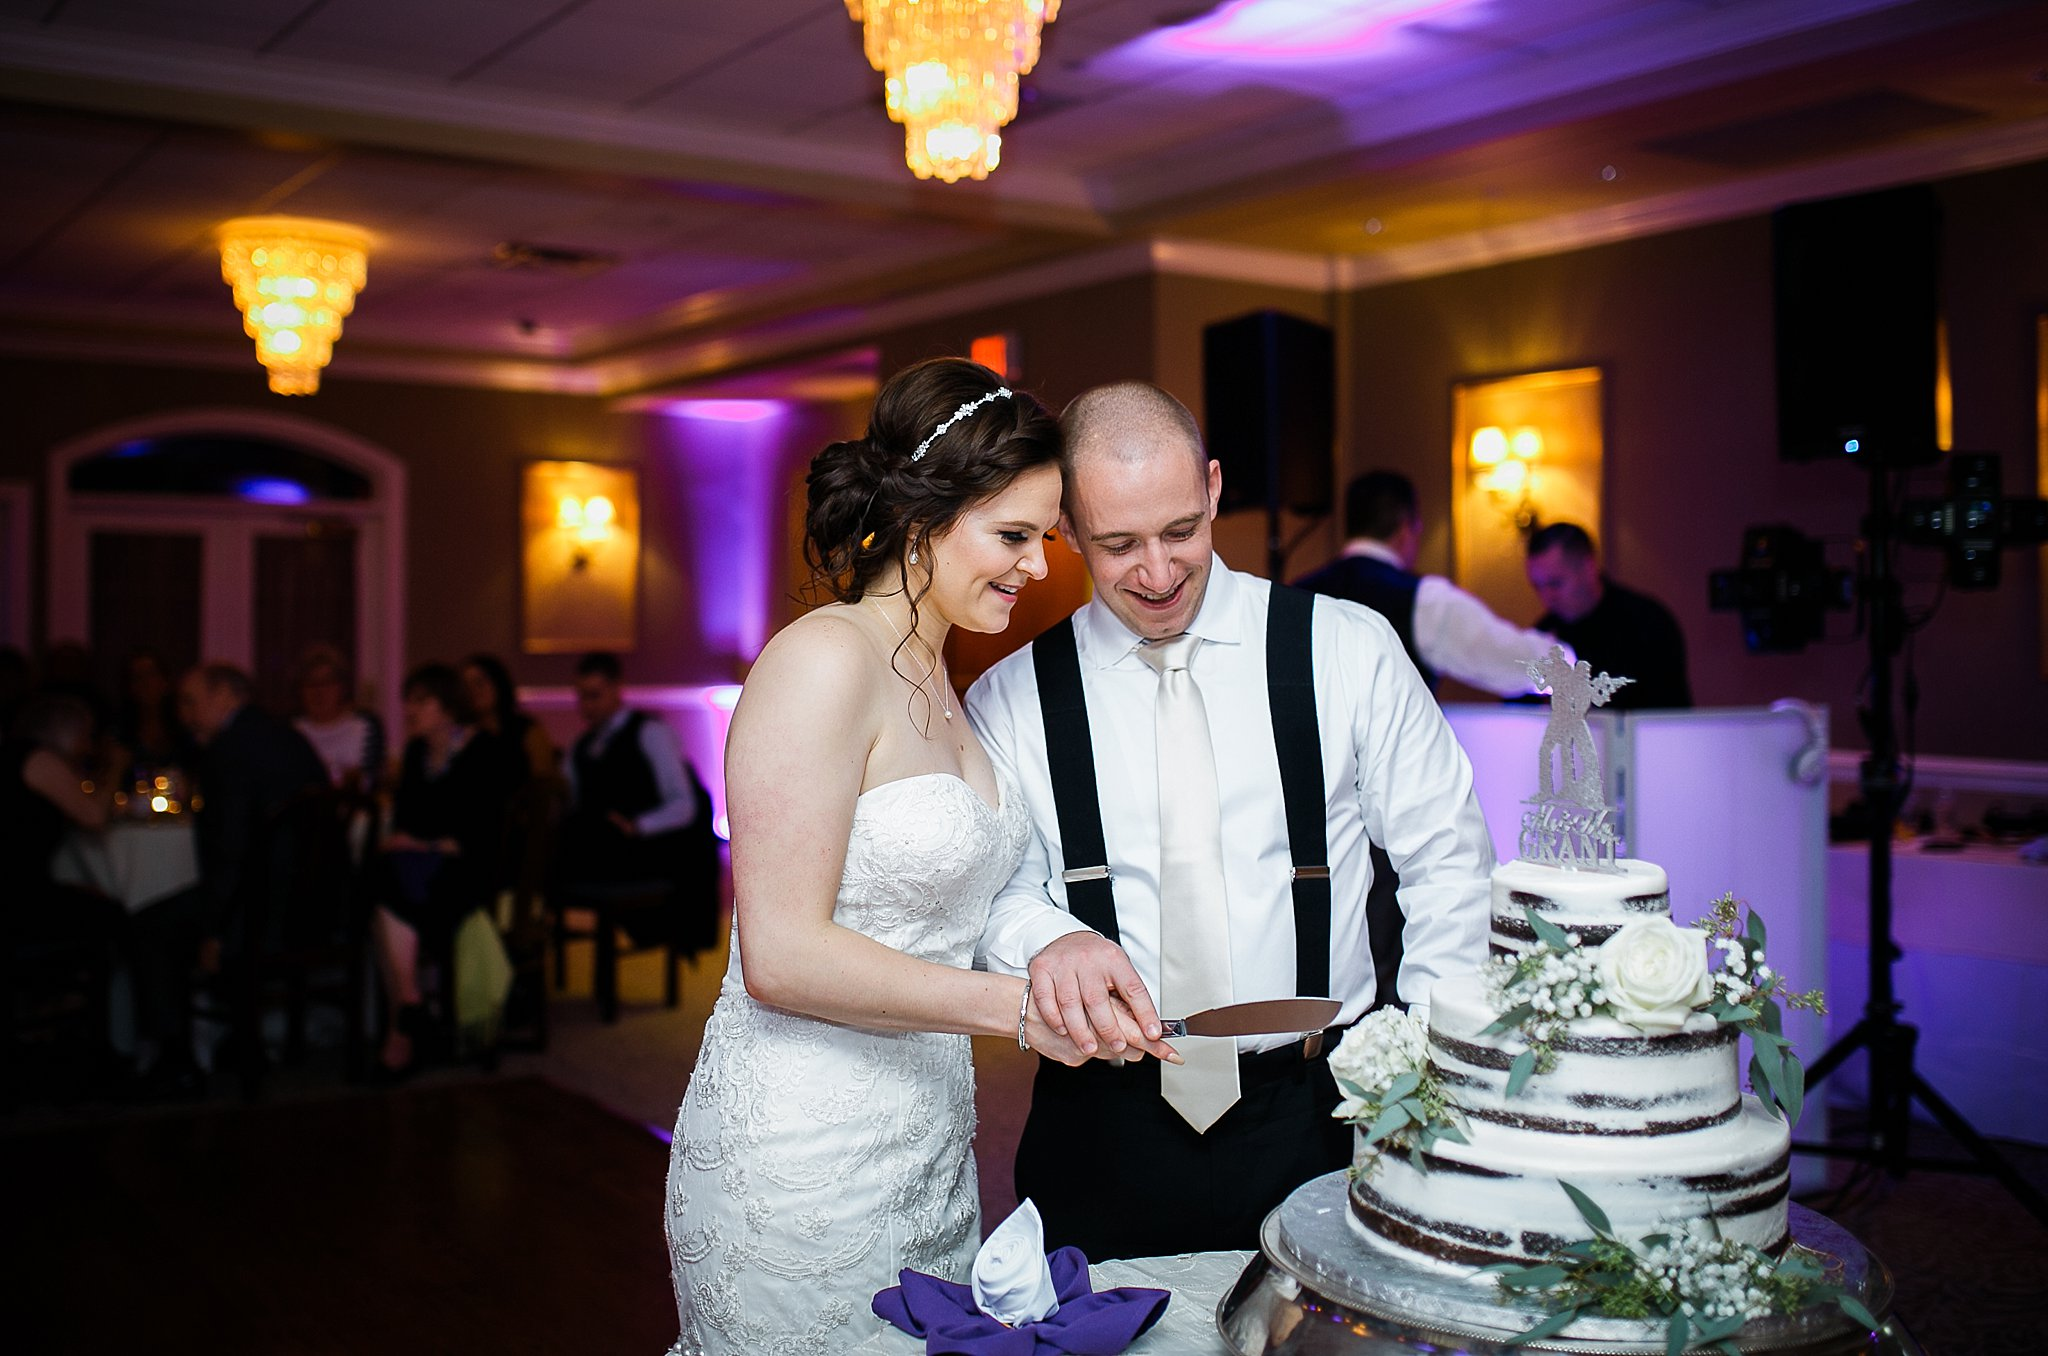 Links at Unionvale Wedding Lagrangeville Wedding Hudson Valley Wedding Photographer Sweet Alice Photography71.jpg